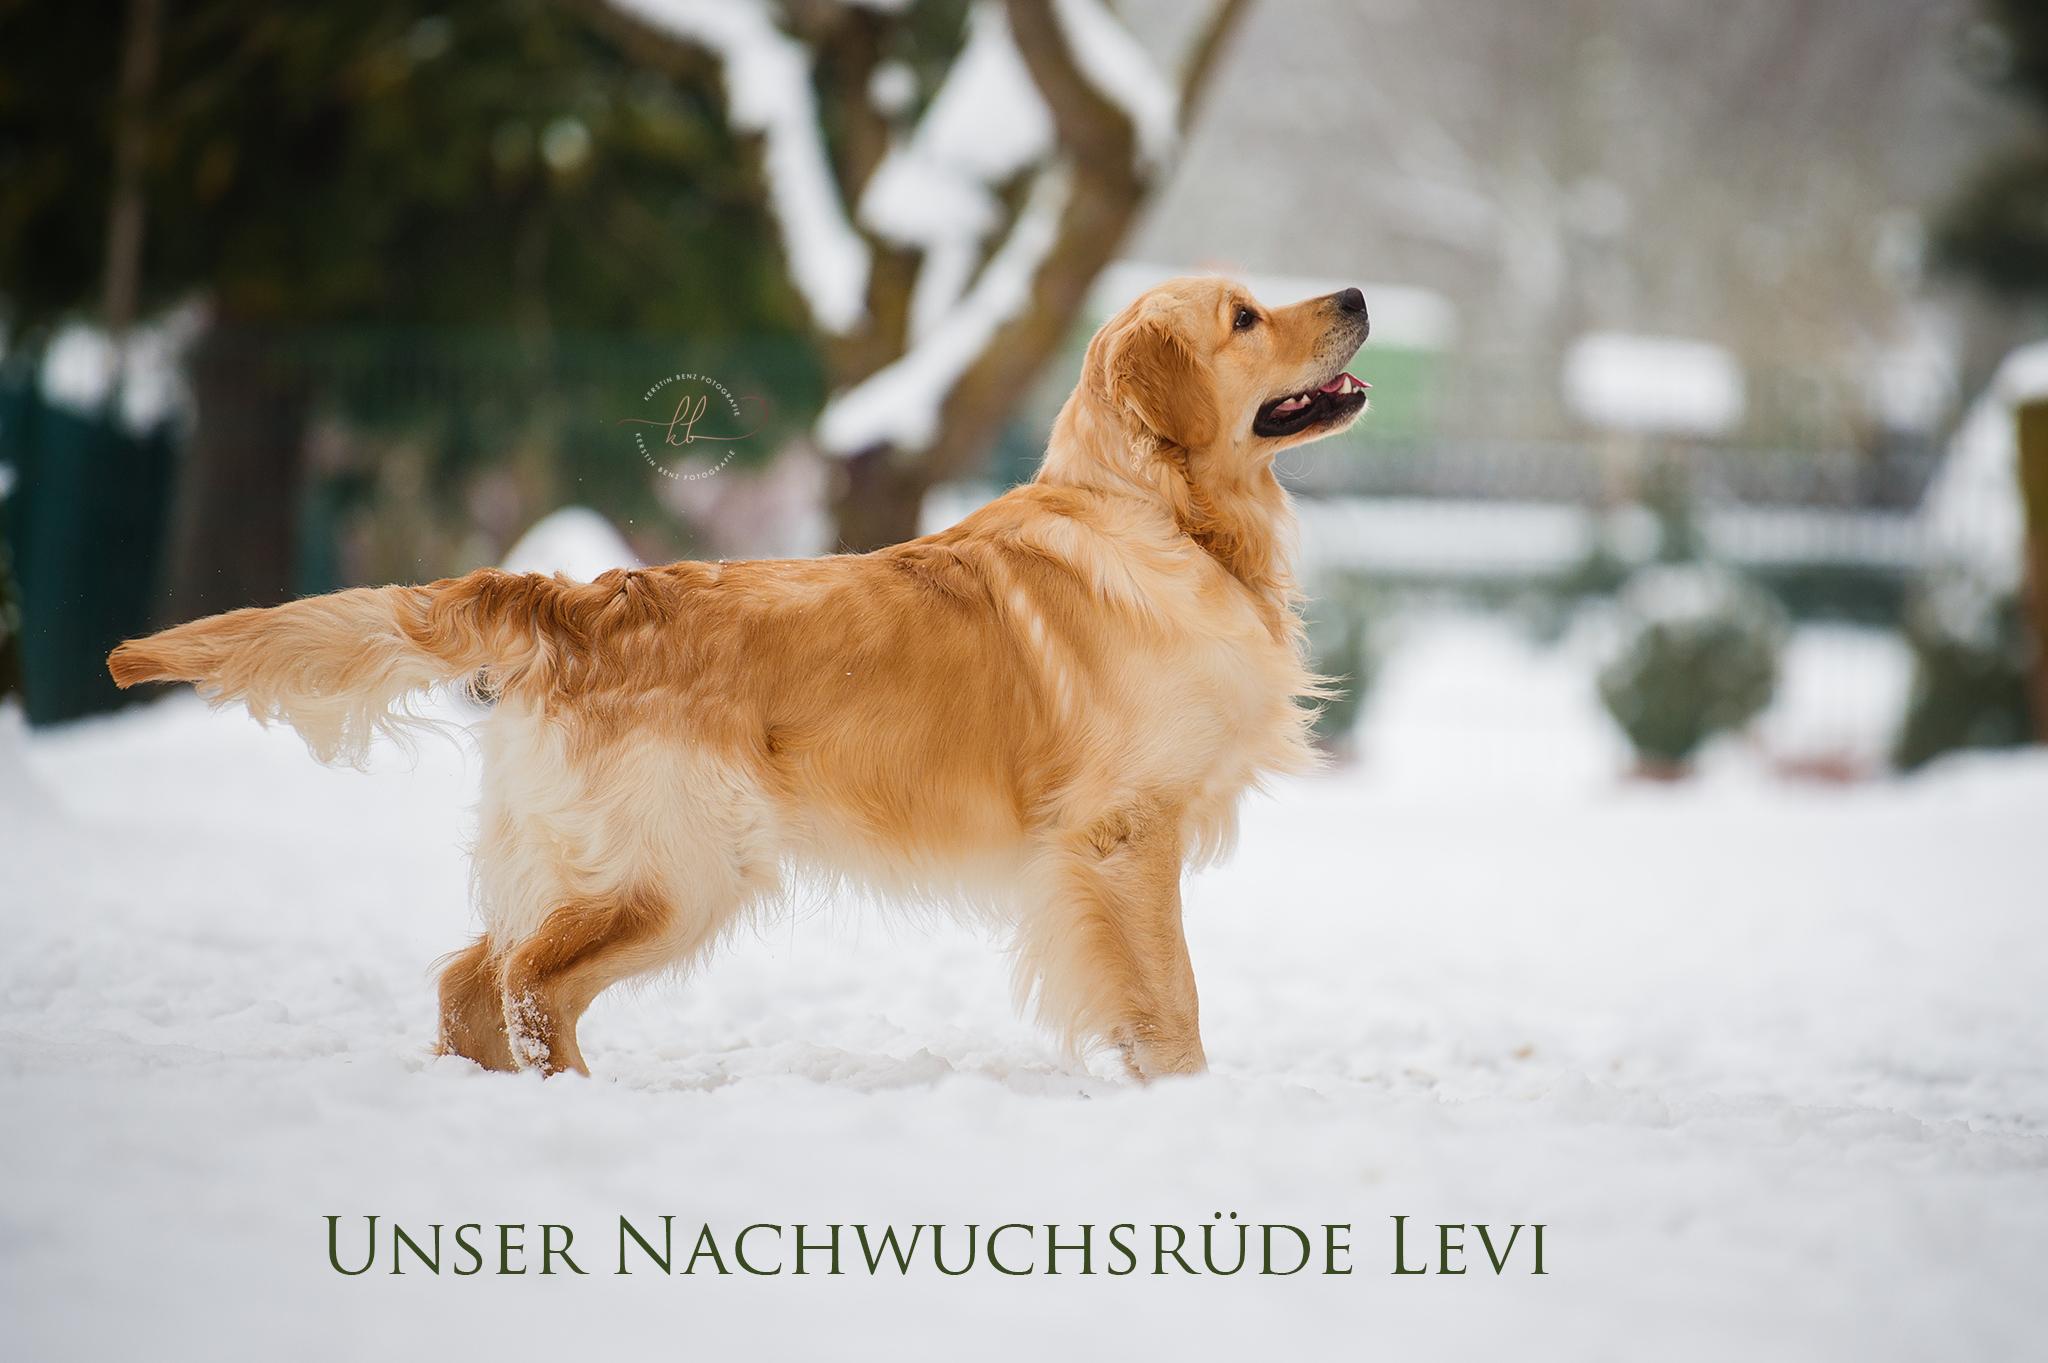 http://goldenretriever-vom-gaelmacker.de/wp-content/uploads/2018/02/Levi-8273-2018-02-09-KerstinBenz-Kopie.jpg